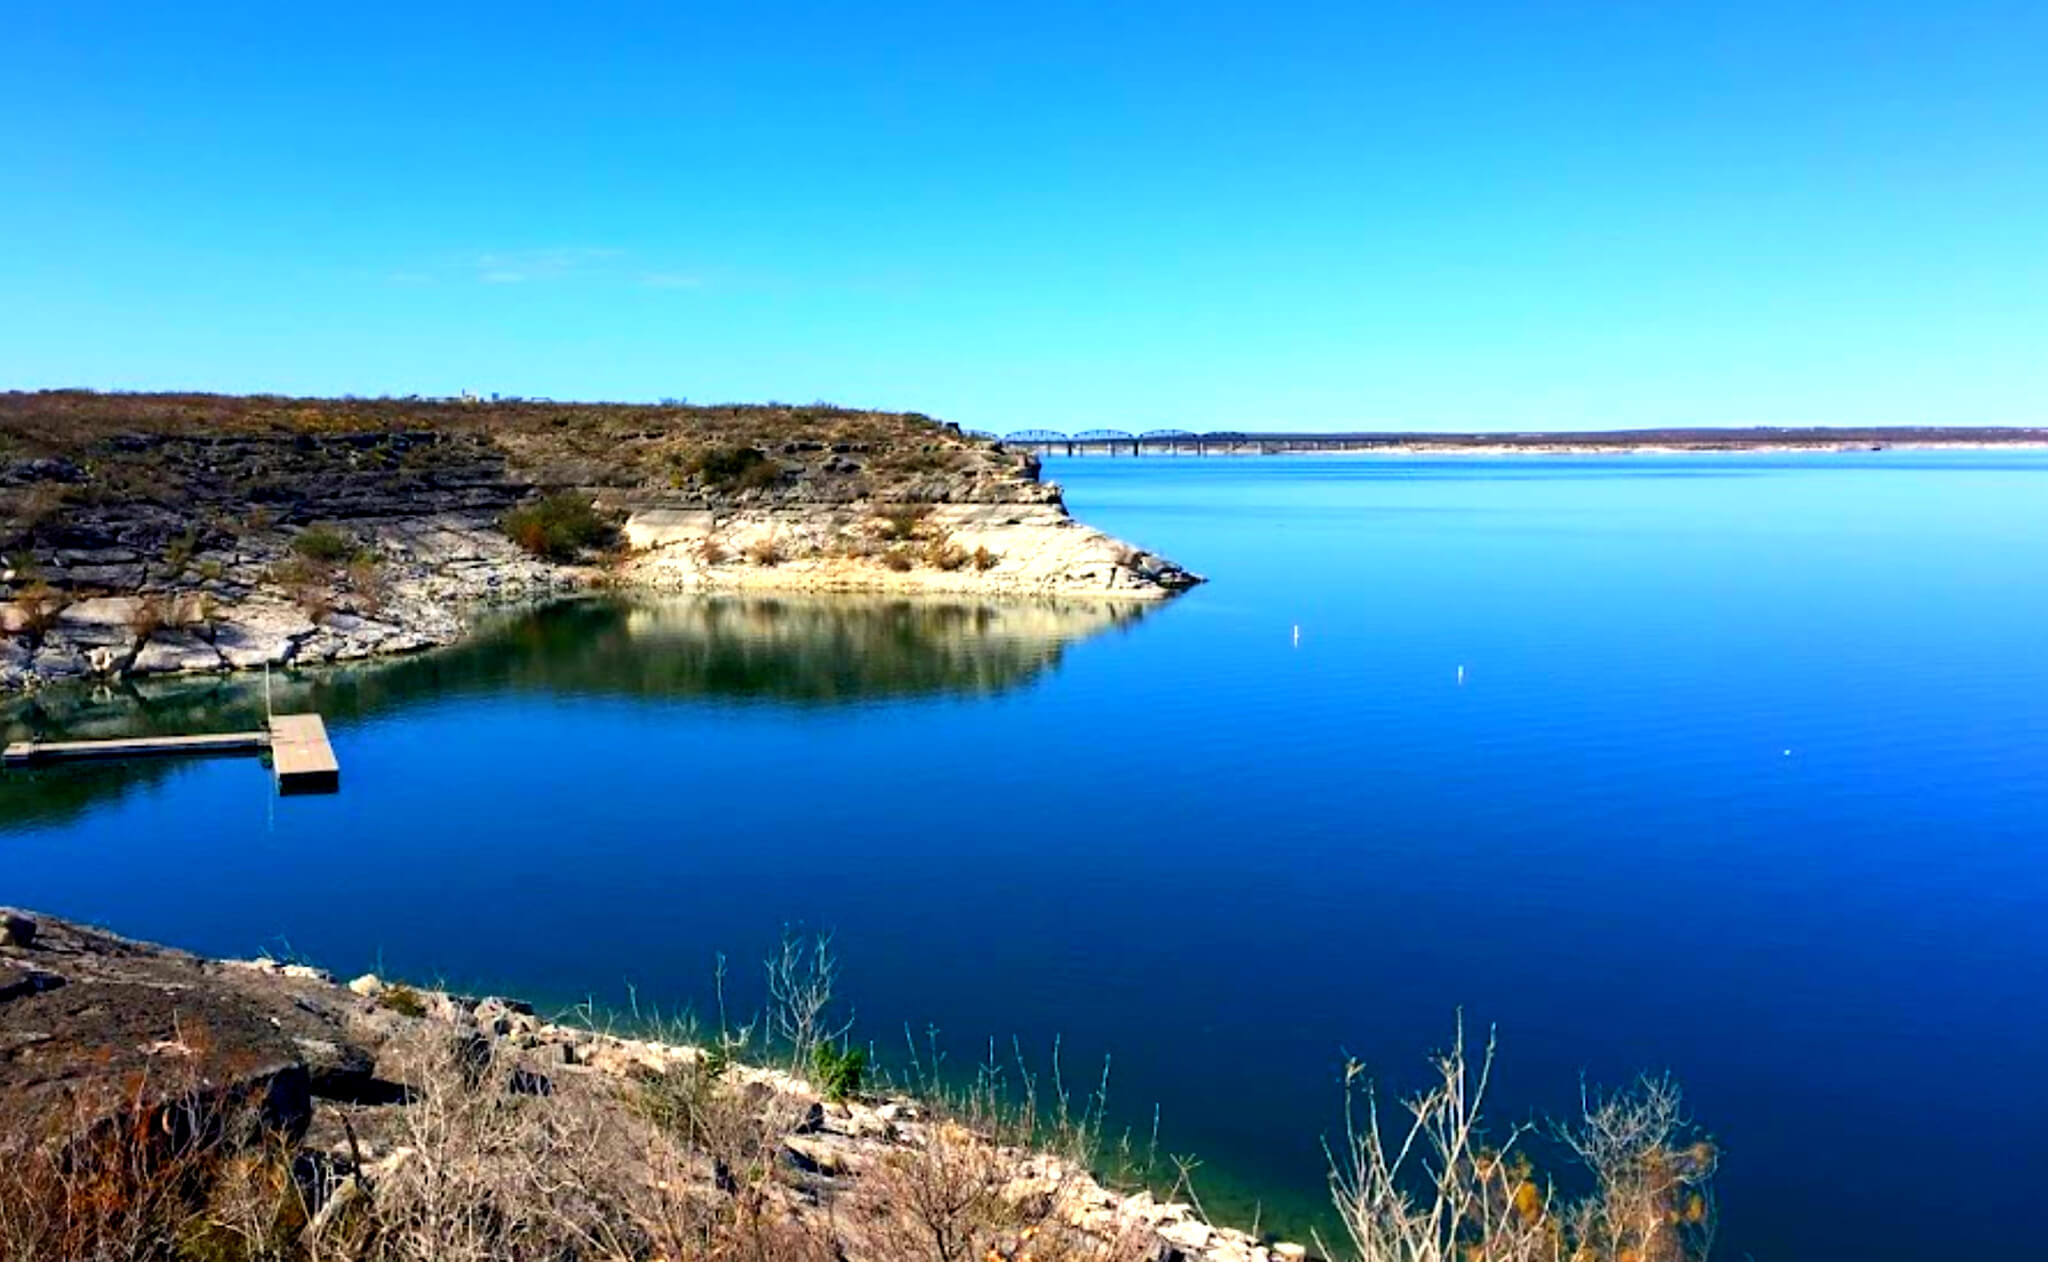 Amistad-Lake-Fishing-Report-Guide-Texas-TX-02